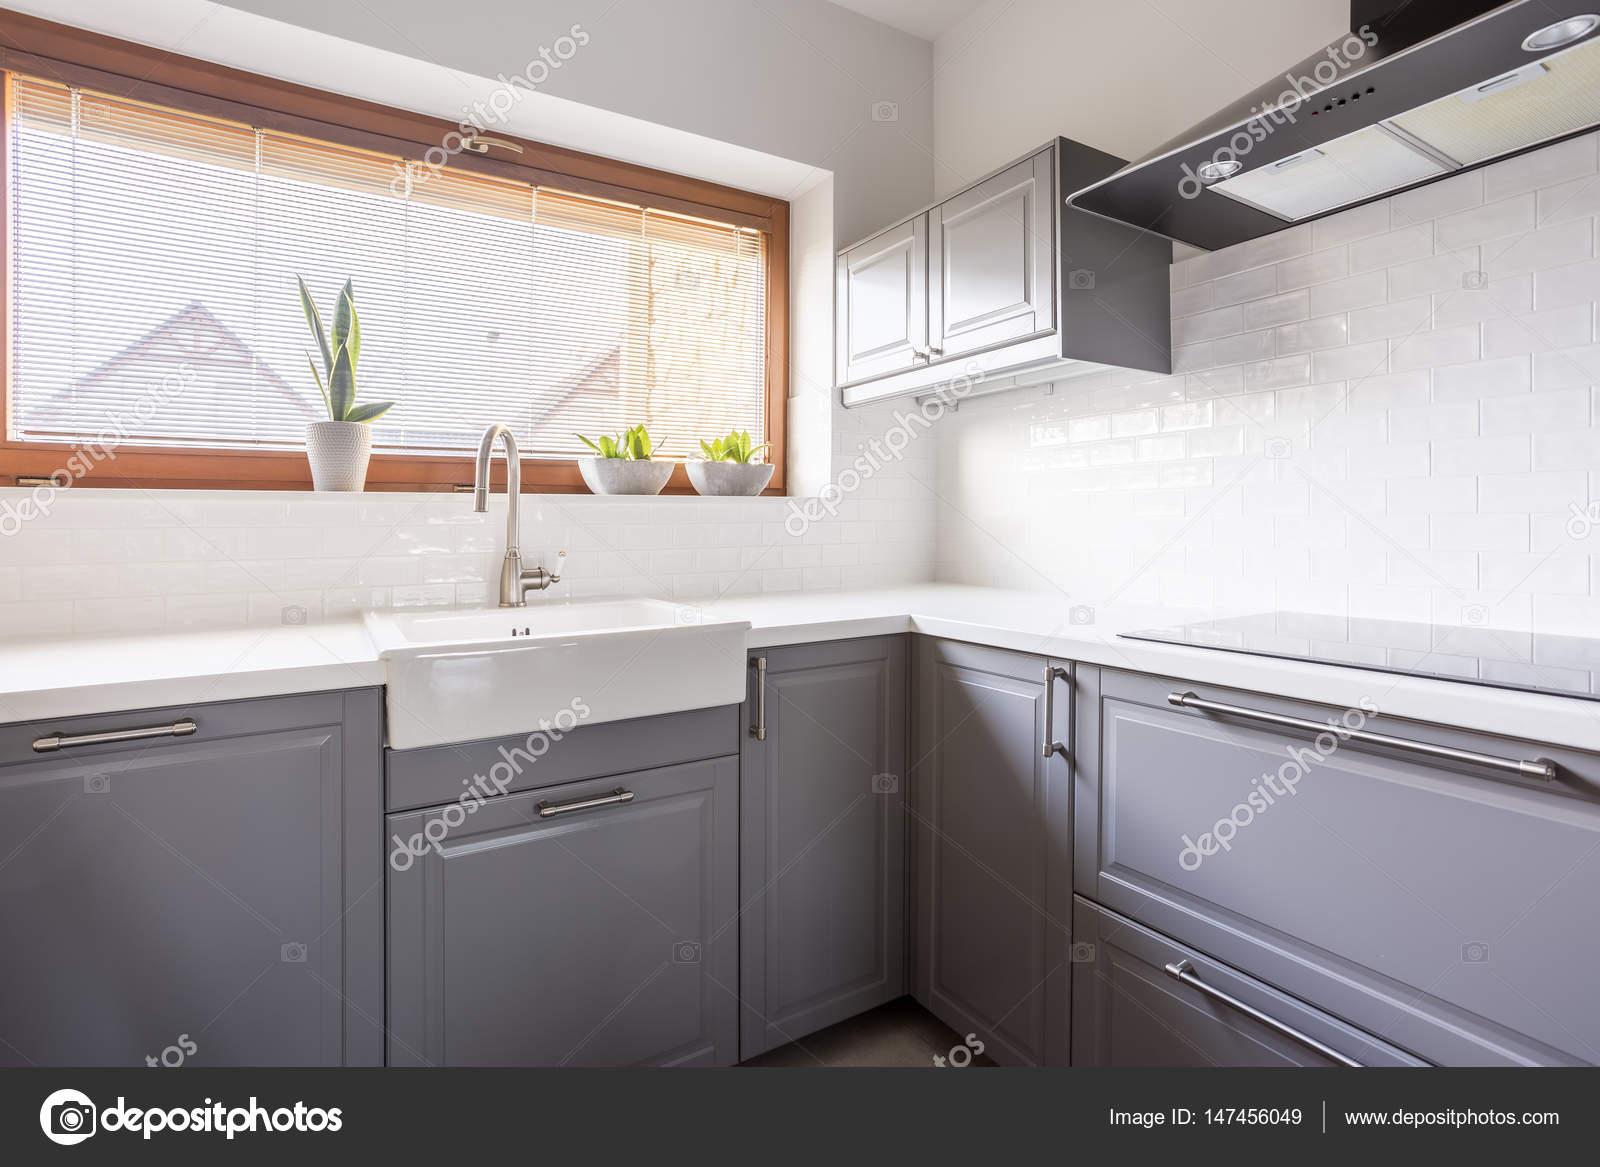 Keuken met luifel u2014 stockfoto © photographee.eu #147456049